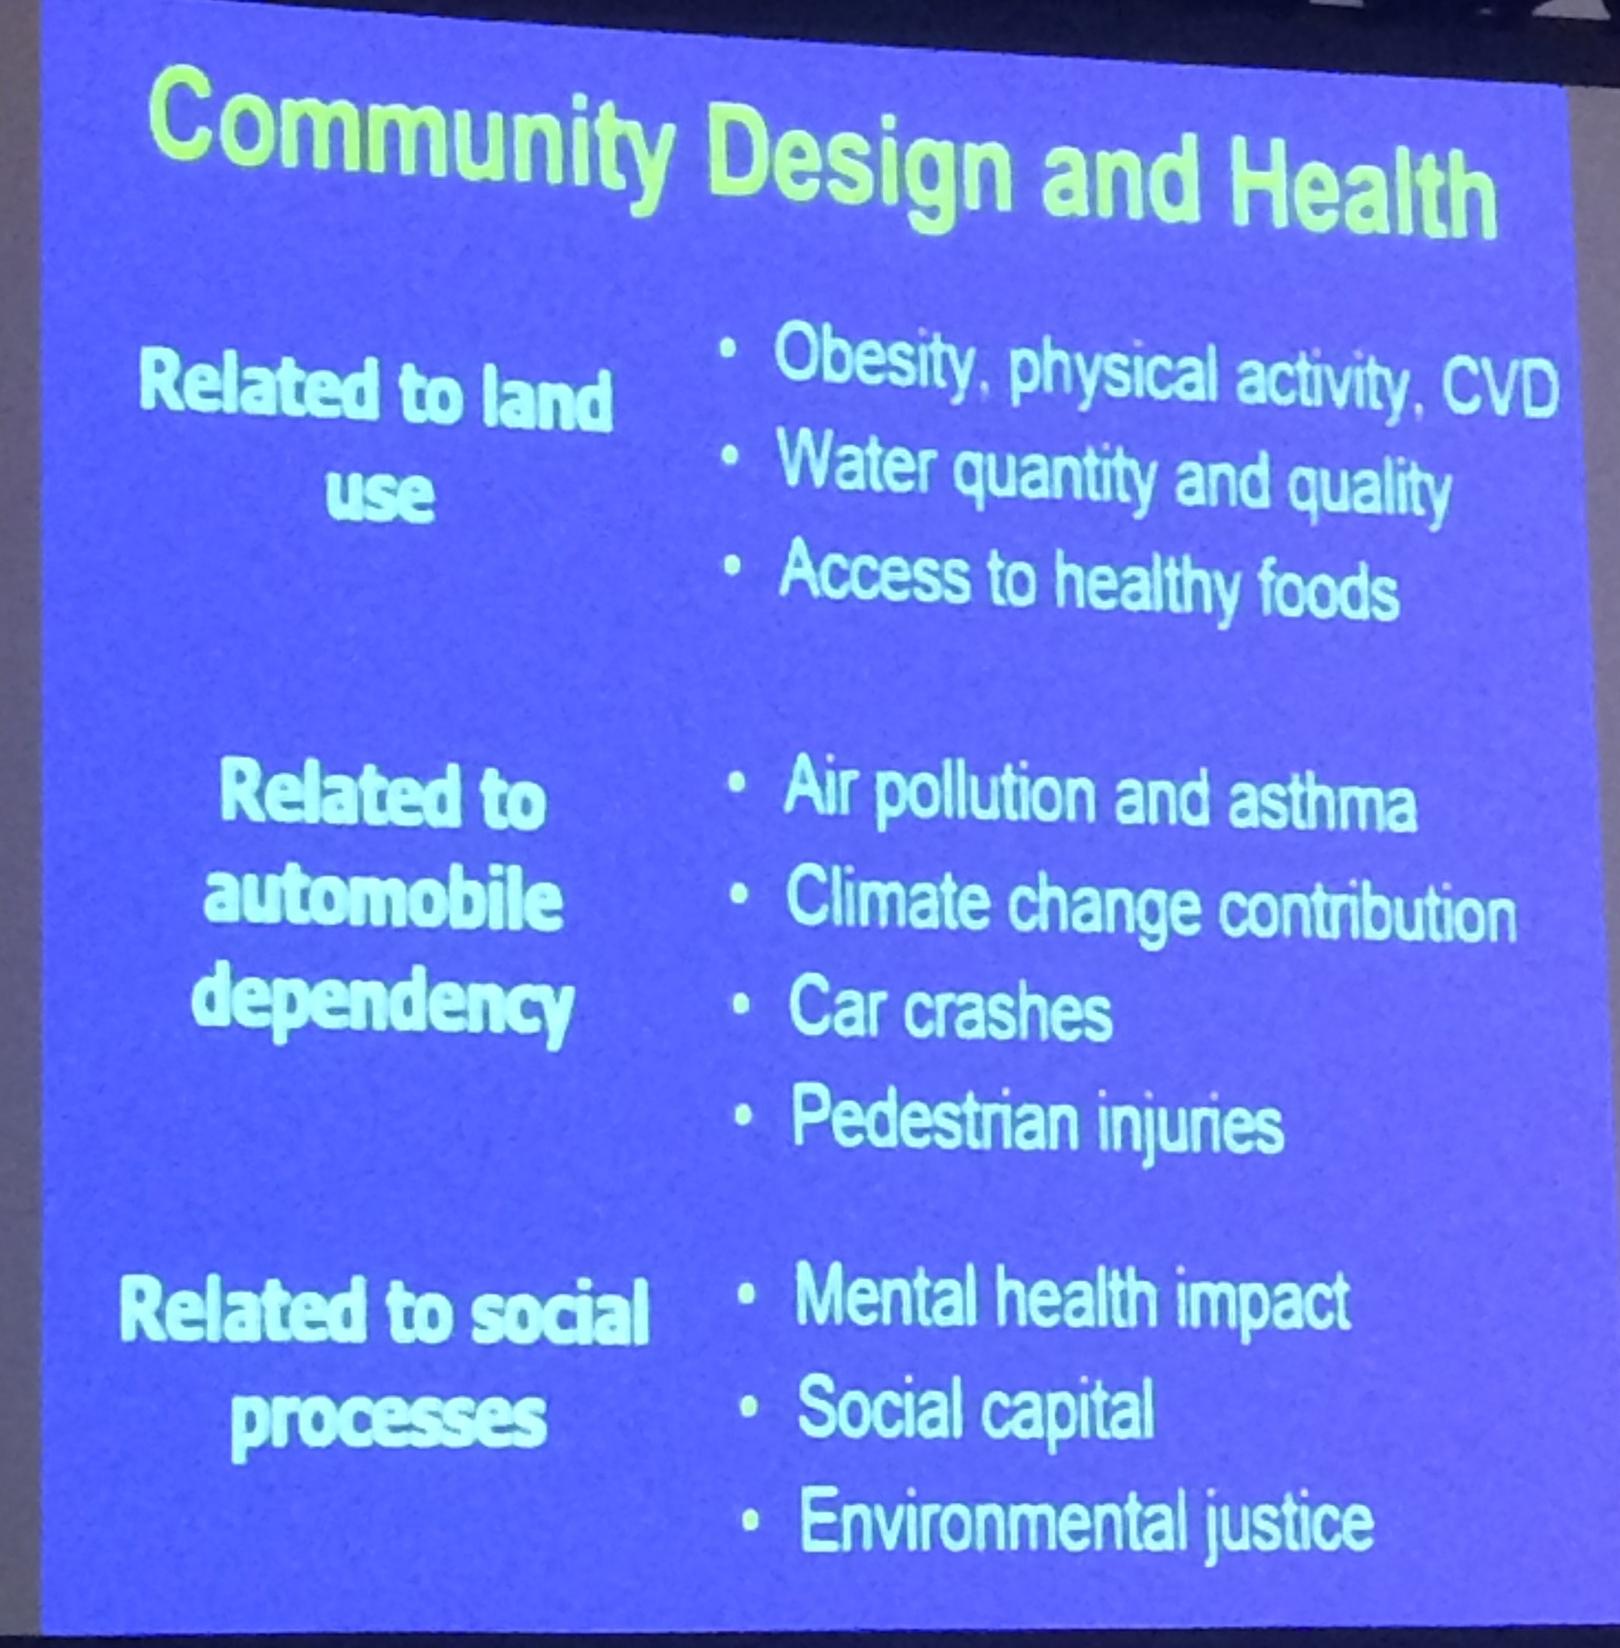 Andrew Dannenberg's slide addressing the built environment and health.